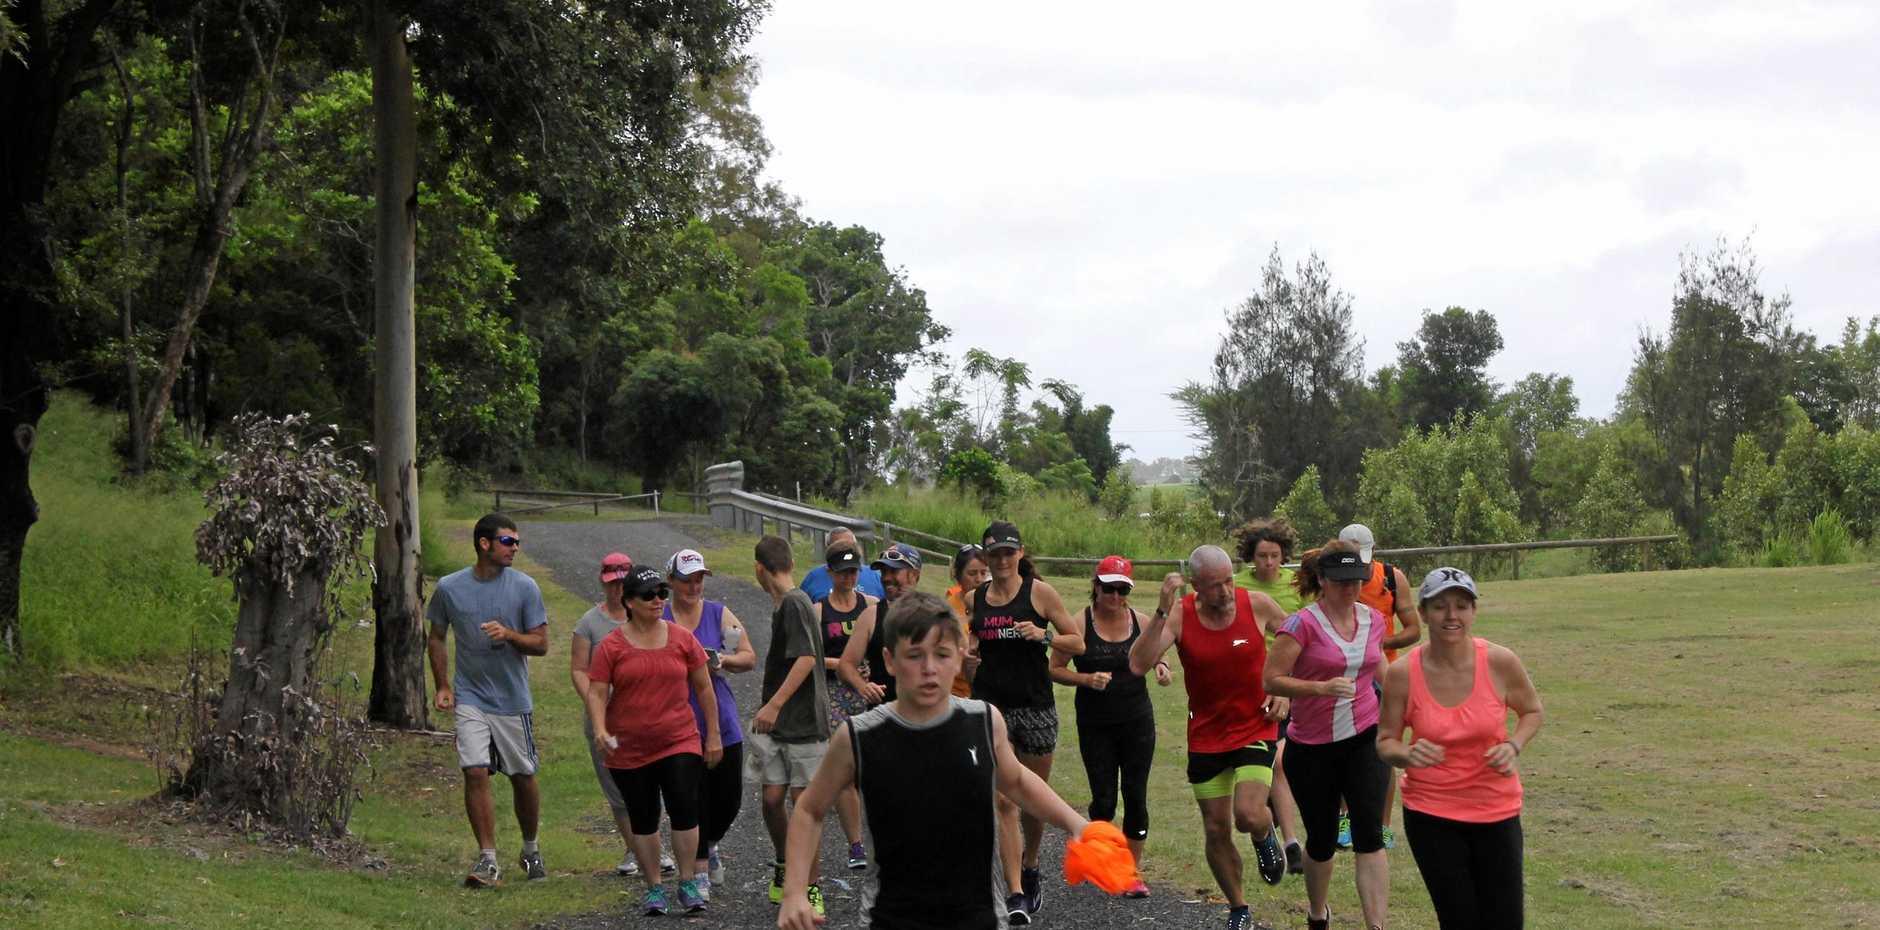 ON THE RUN: Riley Murrell from Tannum Sands Parkrun leads a trial run of the new Bundaberg Parkrun course.